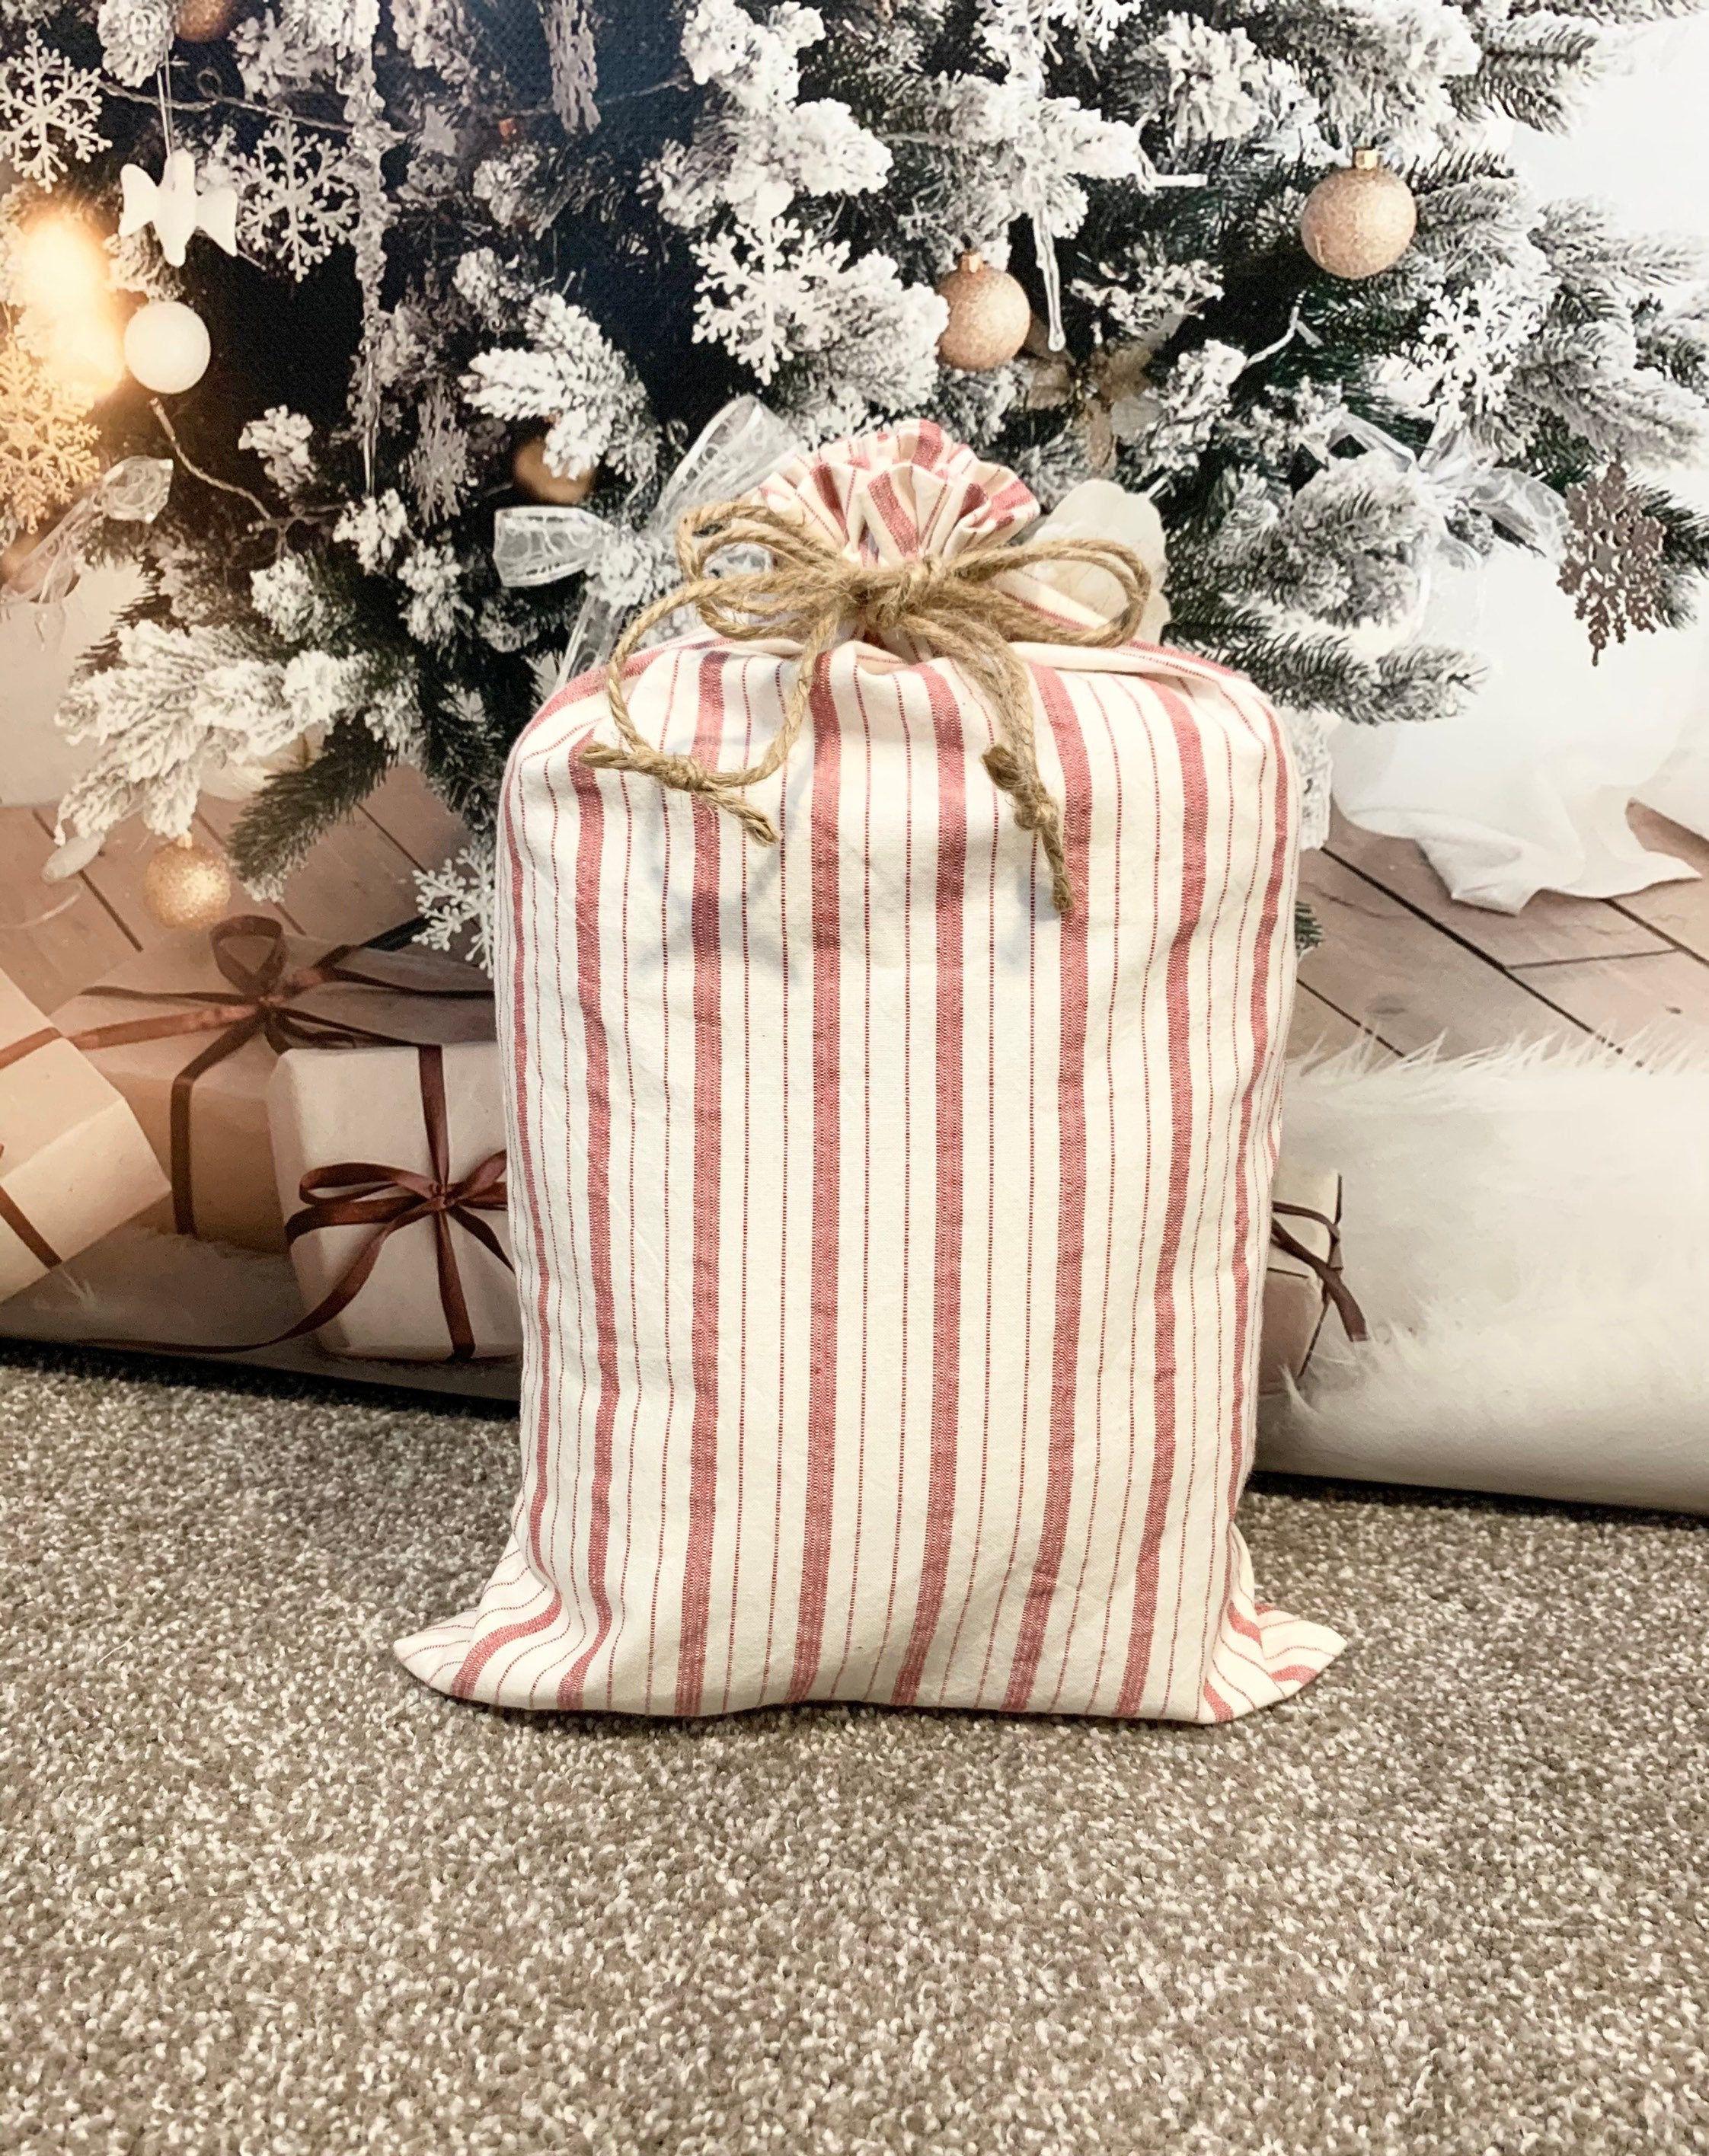 Item BG94 Decorated Christmas Ornaments Fabric Gift Bag